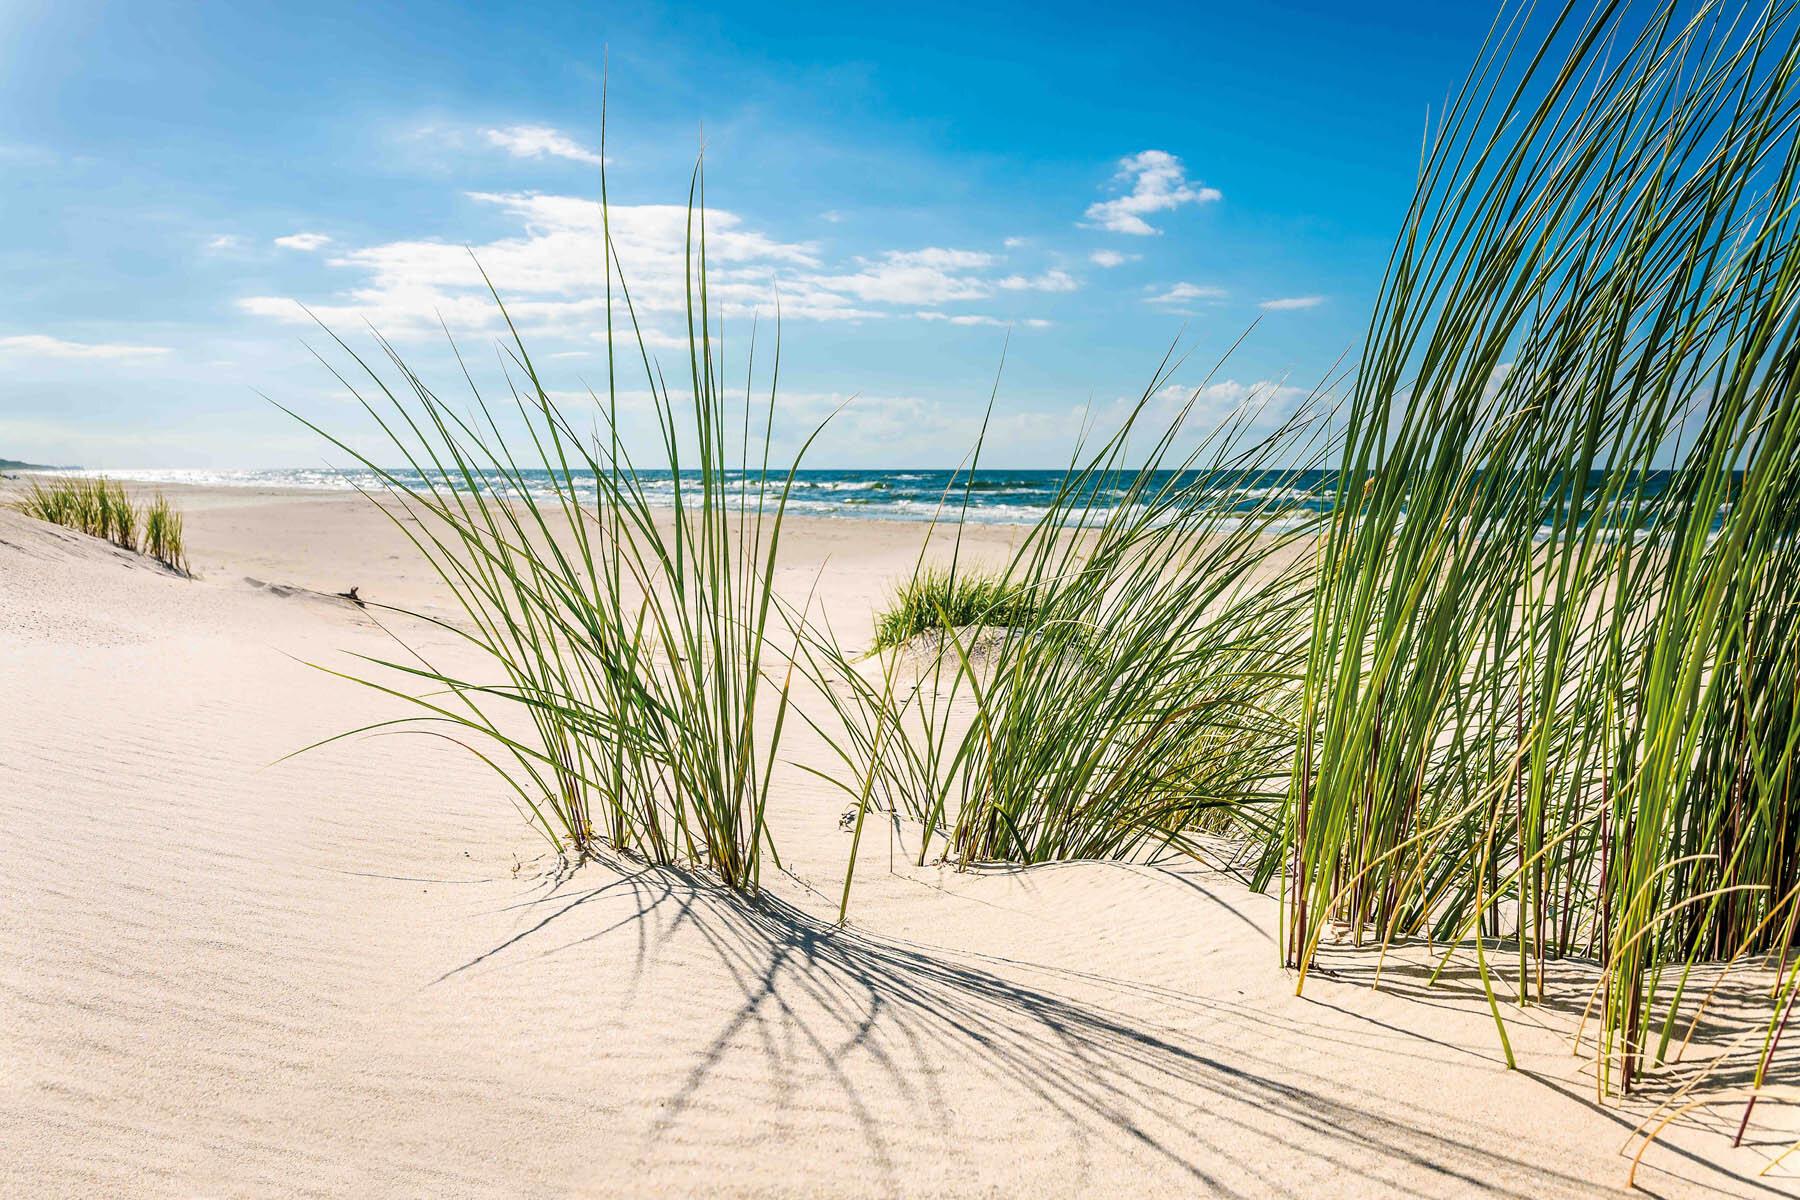 PlateART Duschrückwand mit Motiv Strand und Meer Sand Gras